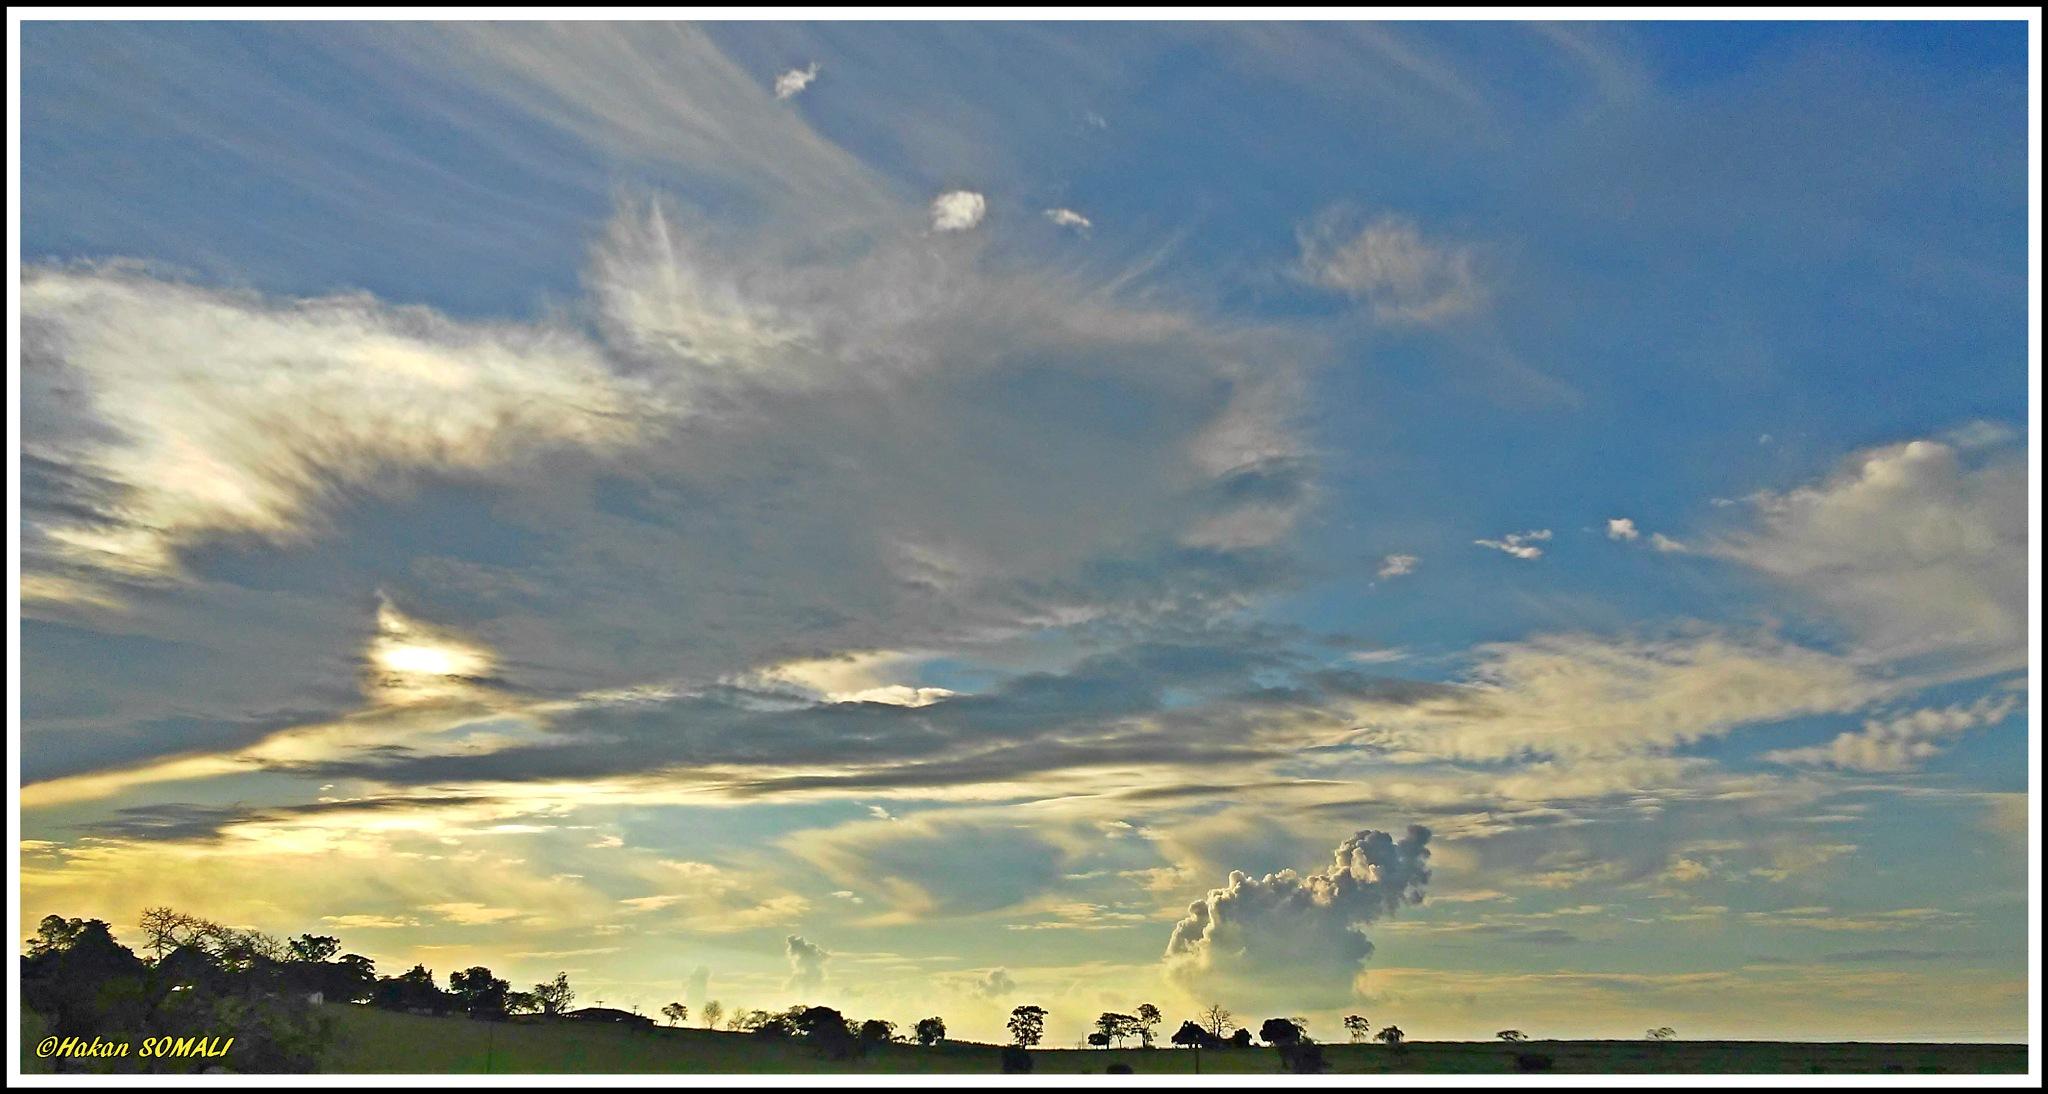 Beautiful cloud formations in rural area of São Paulo / Brazil by Hakan Somali